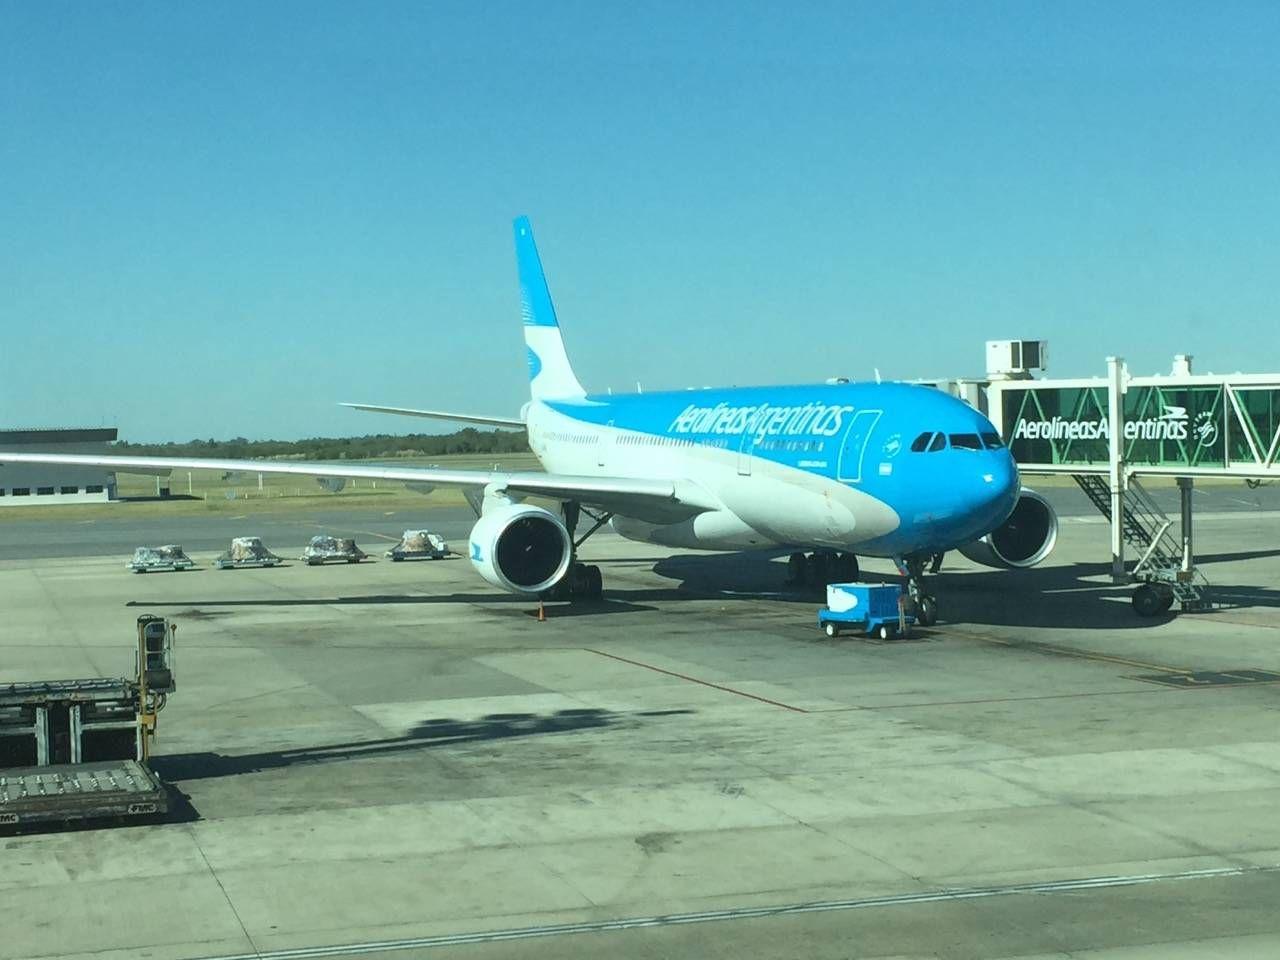 Aerolineas Argentinas Classe Executiva Business Class -01